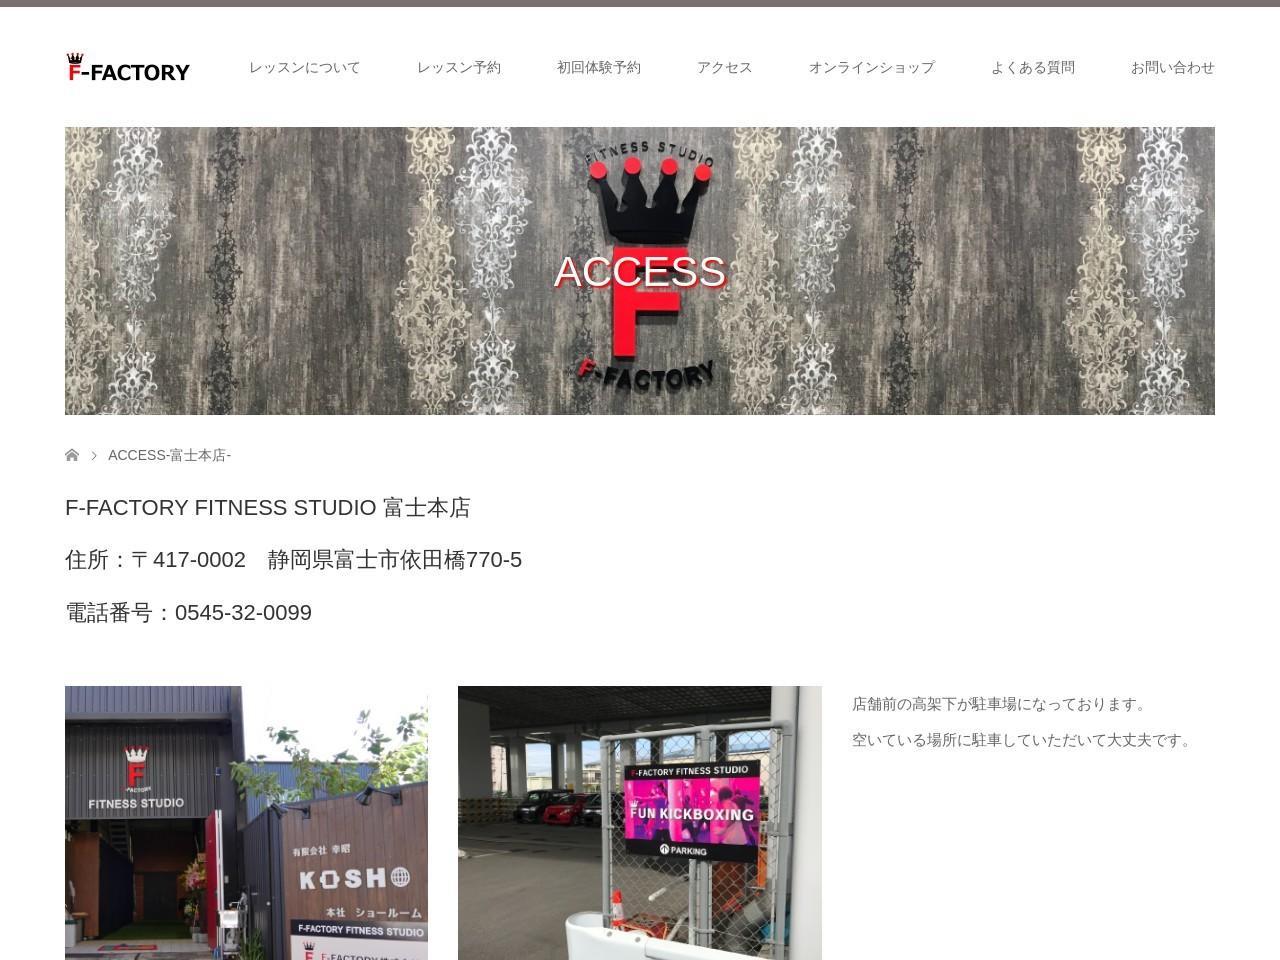 F-FACTORY富士本店のイメージ写真